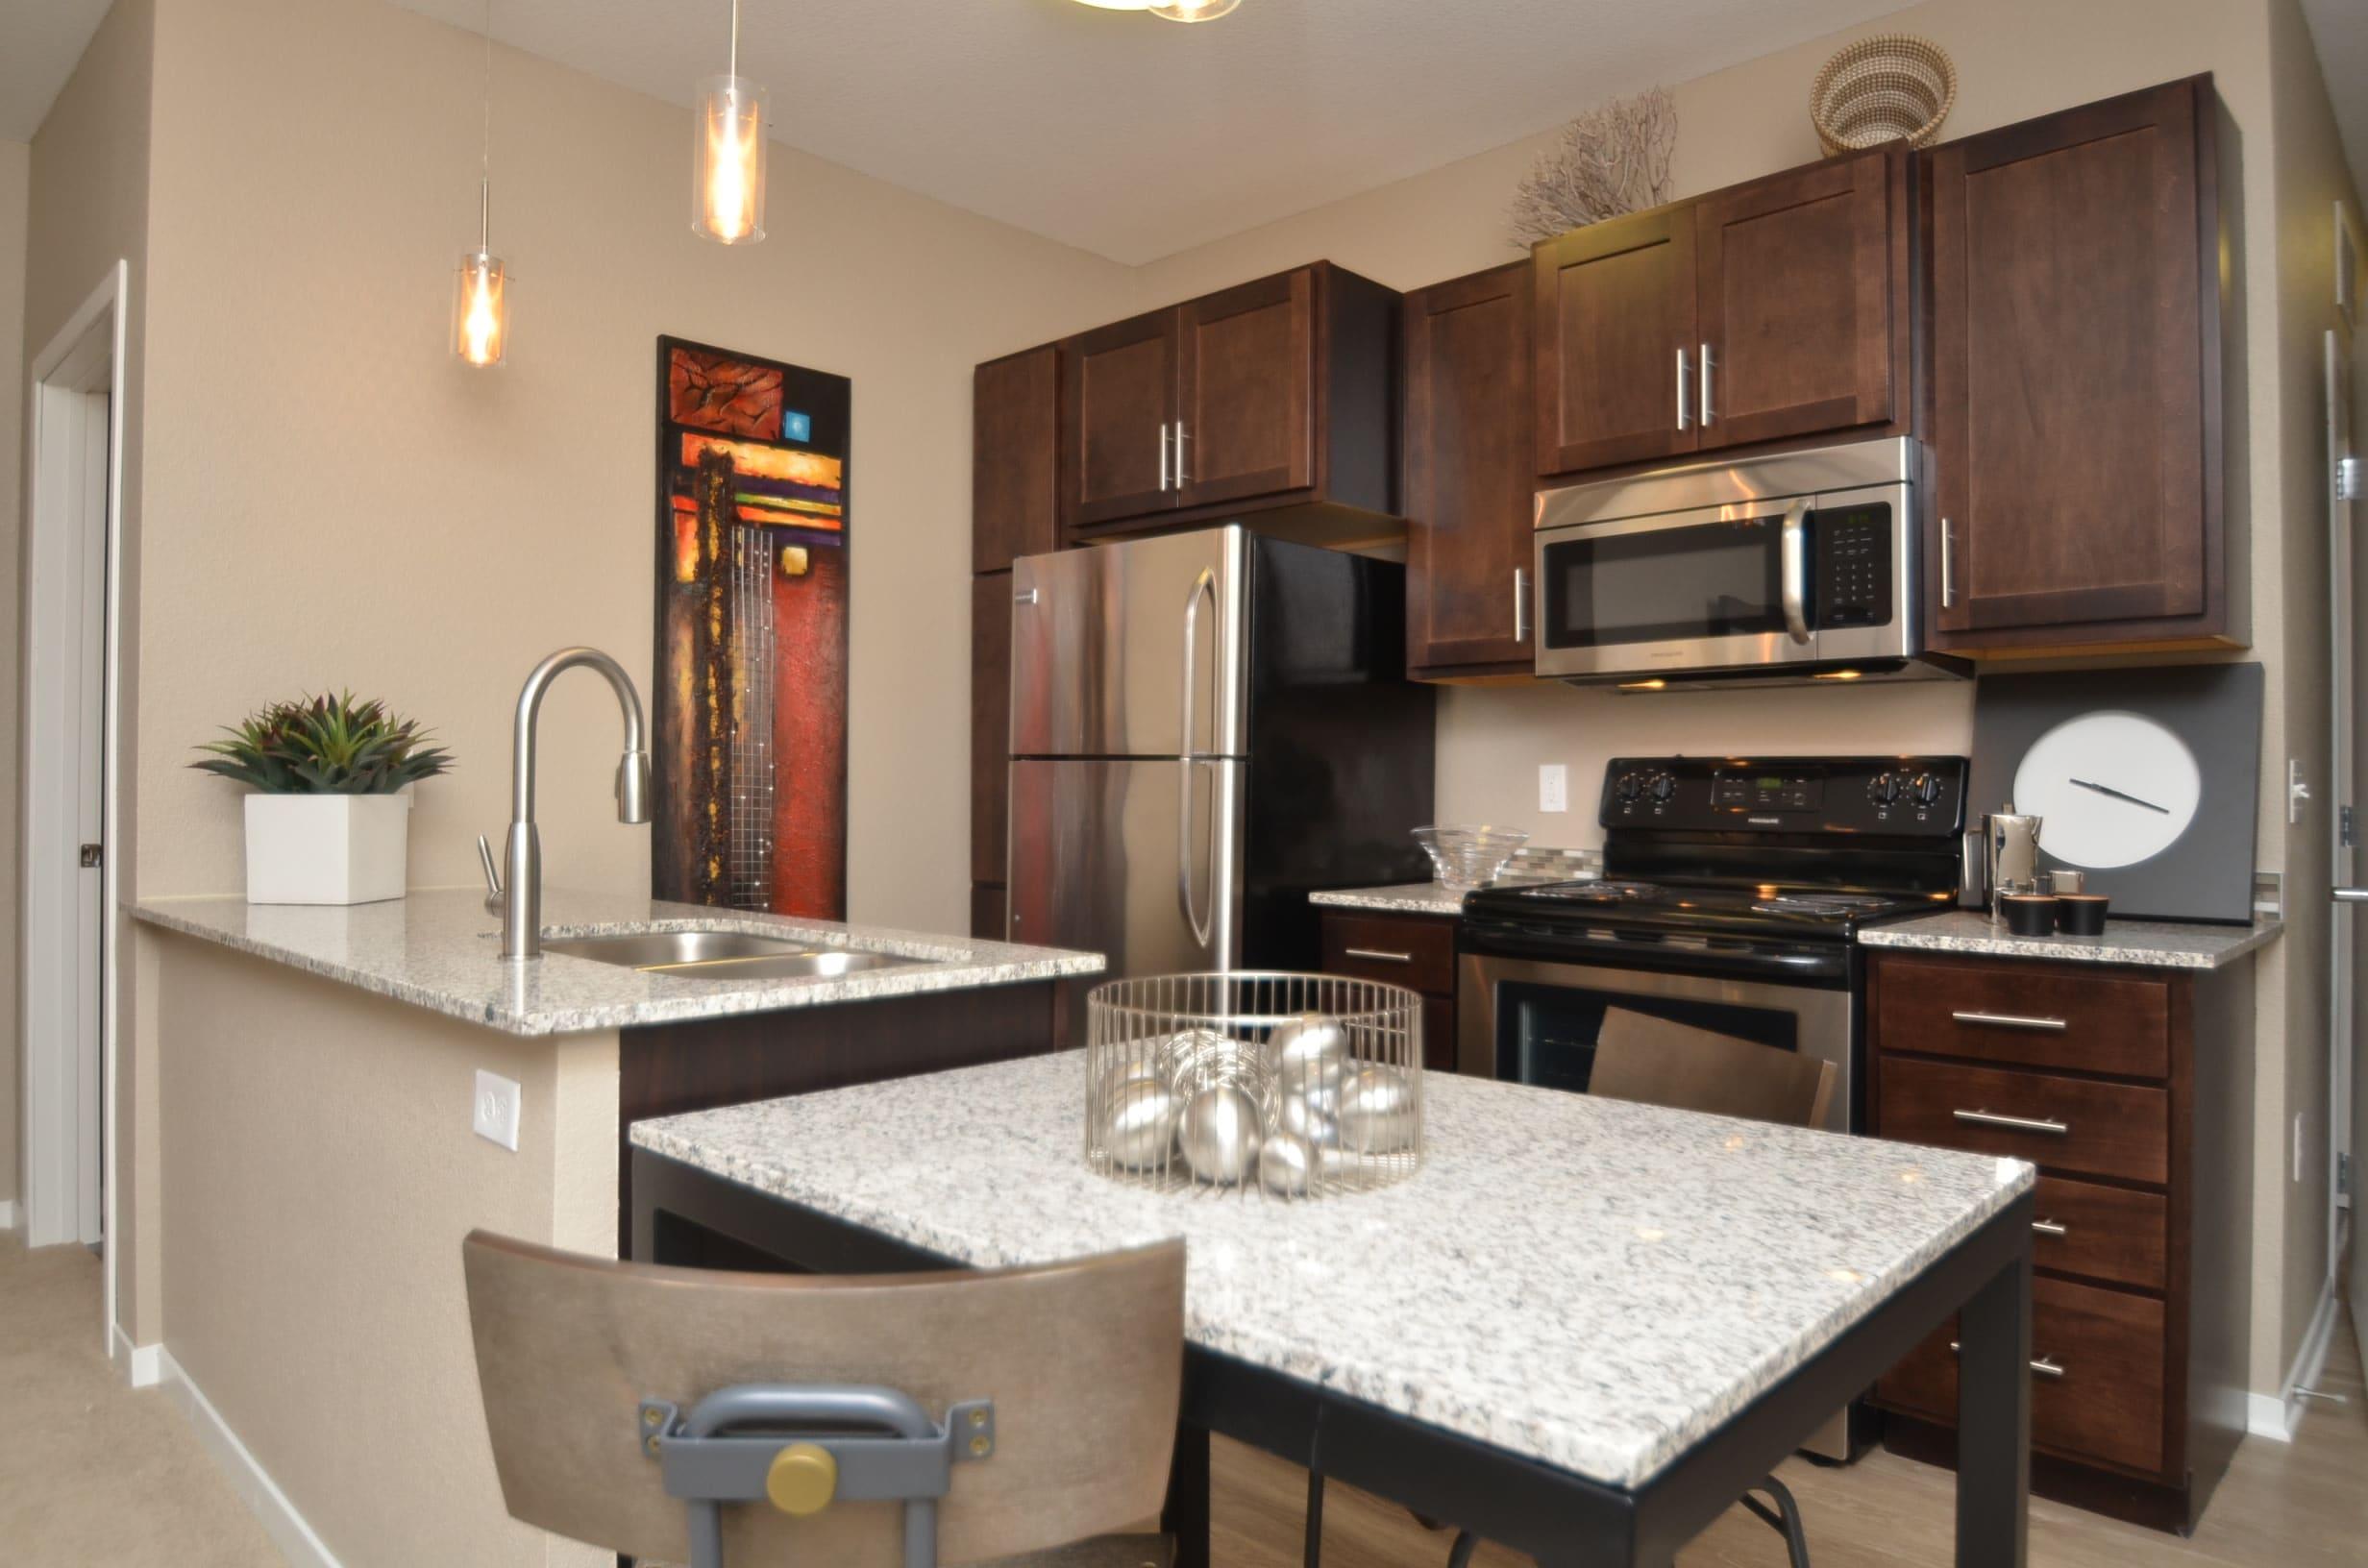 100 Best 2 Bedroom Apartments In Minneapolis Mn